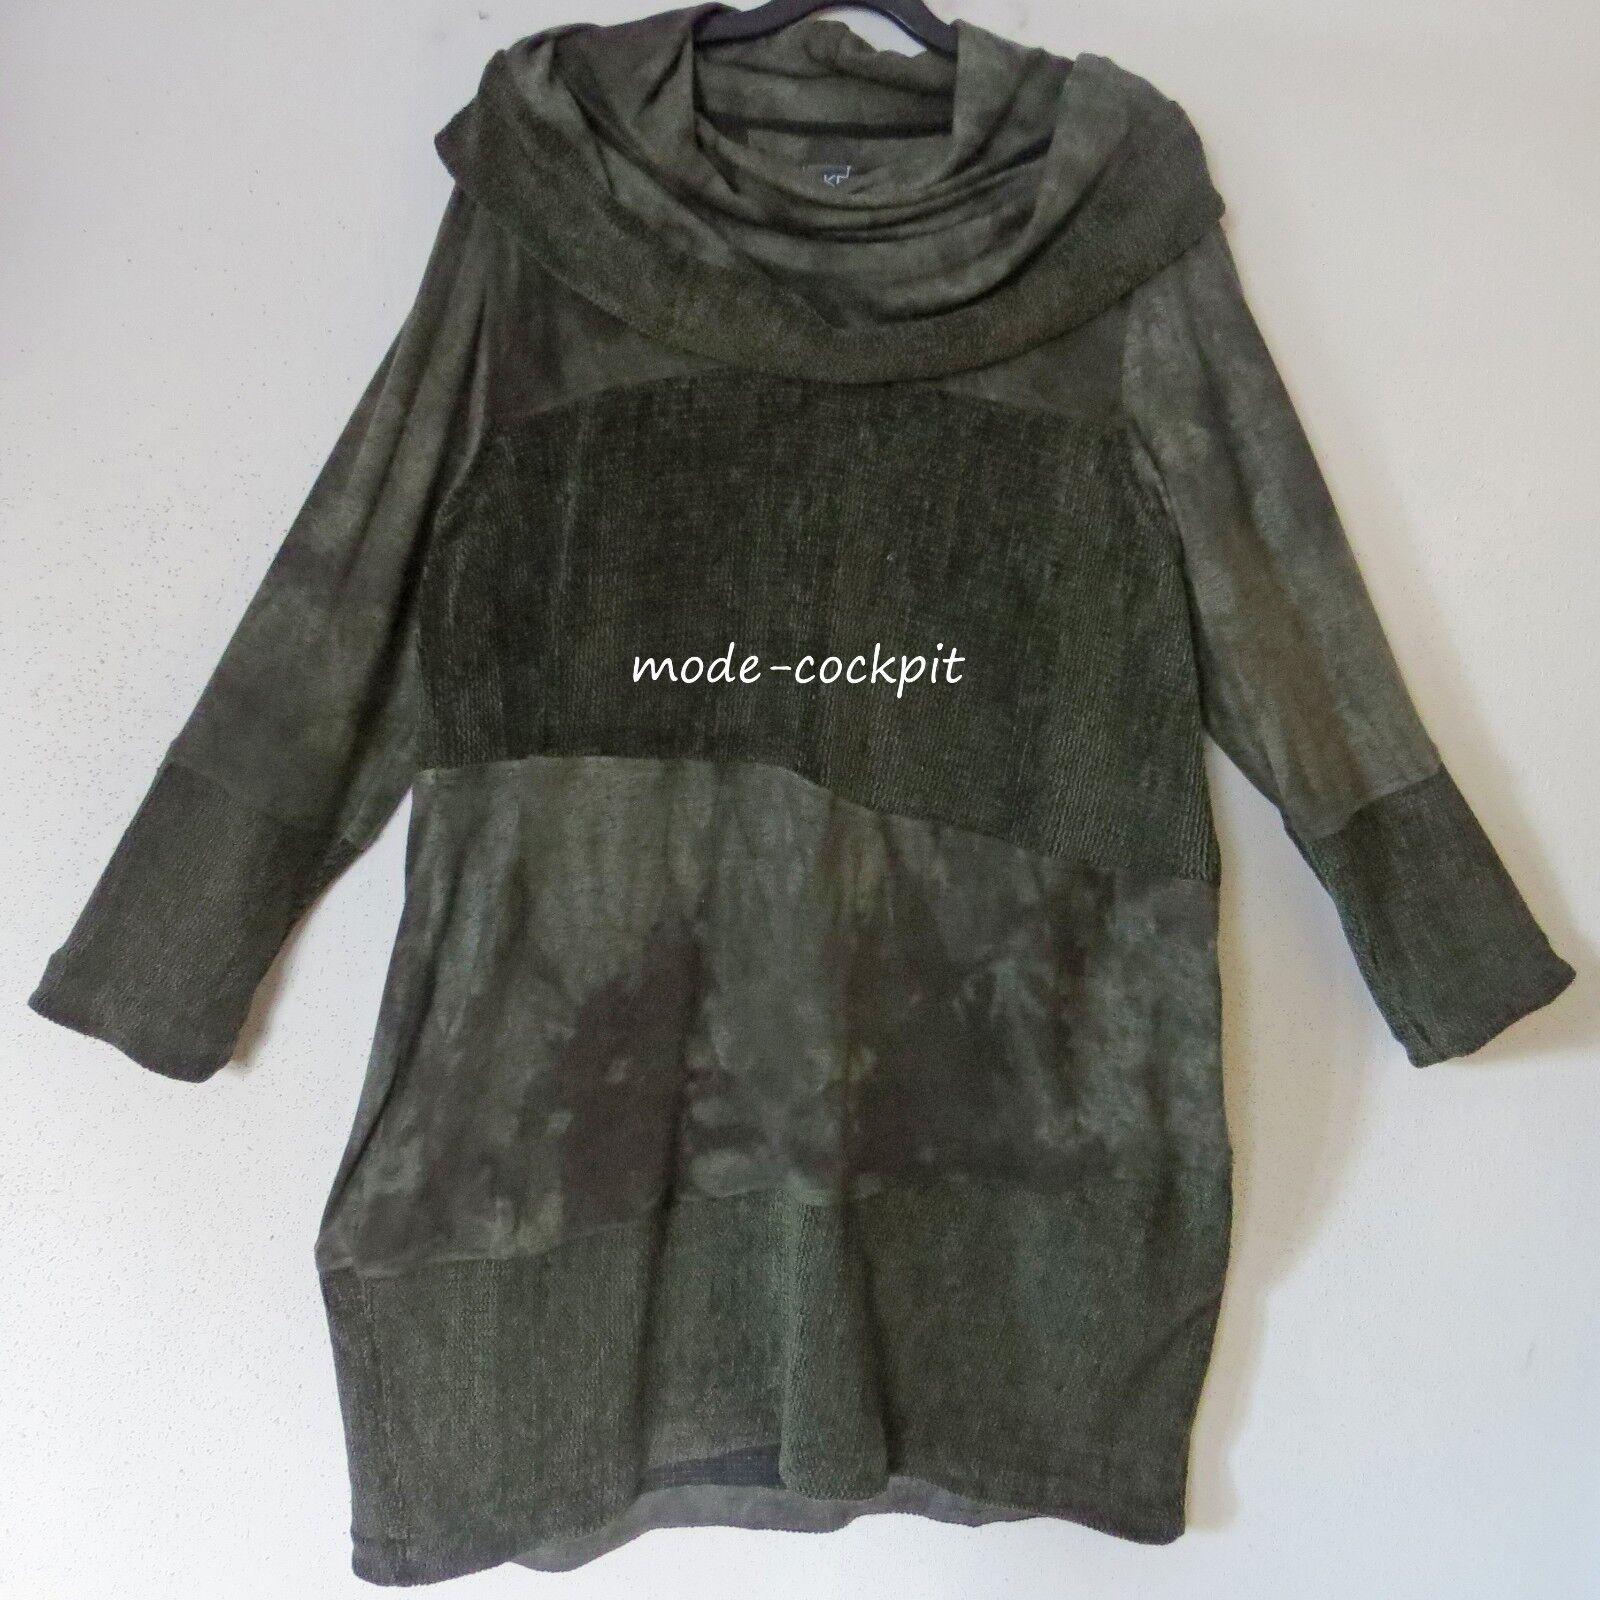 KEKOO softes Kuschel Tunika Kleid Batik Materialmix Schalkragen grün 50-52 (4)